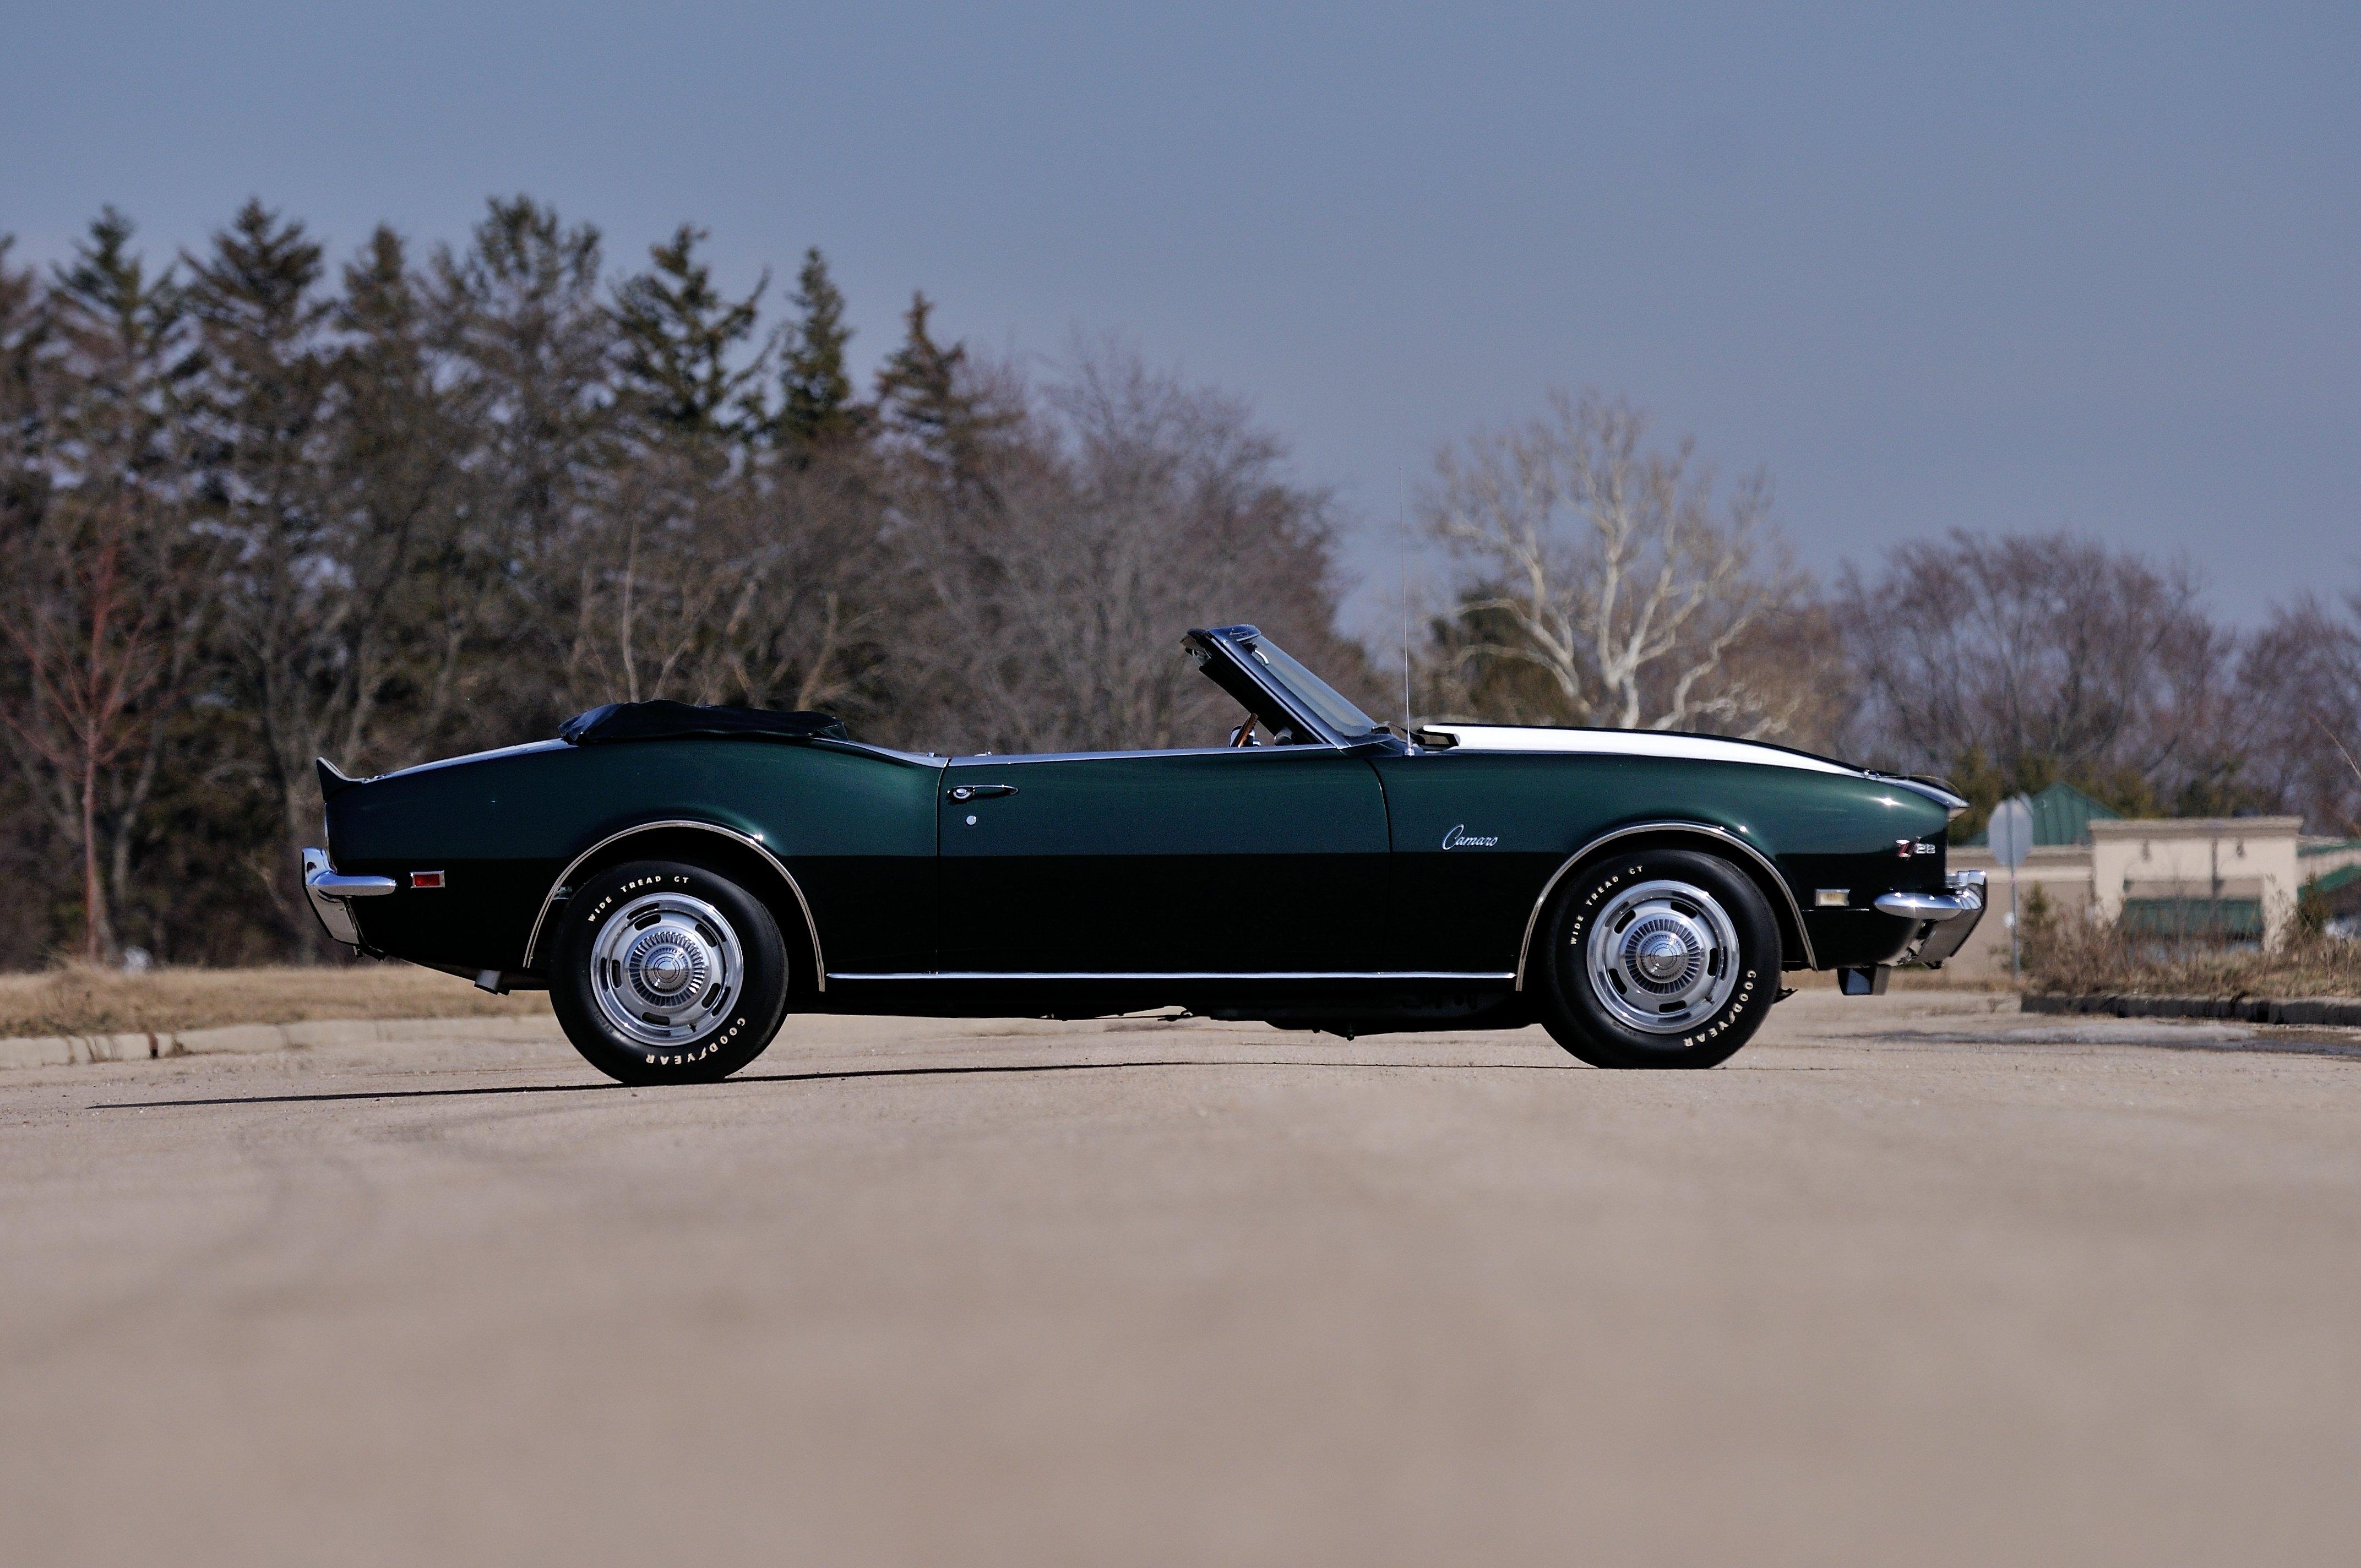 1968 camaro z28 convertible images - Camaro z28 ...